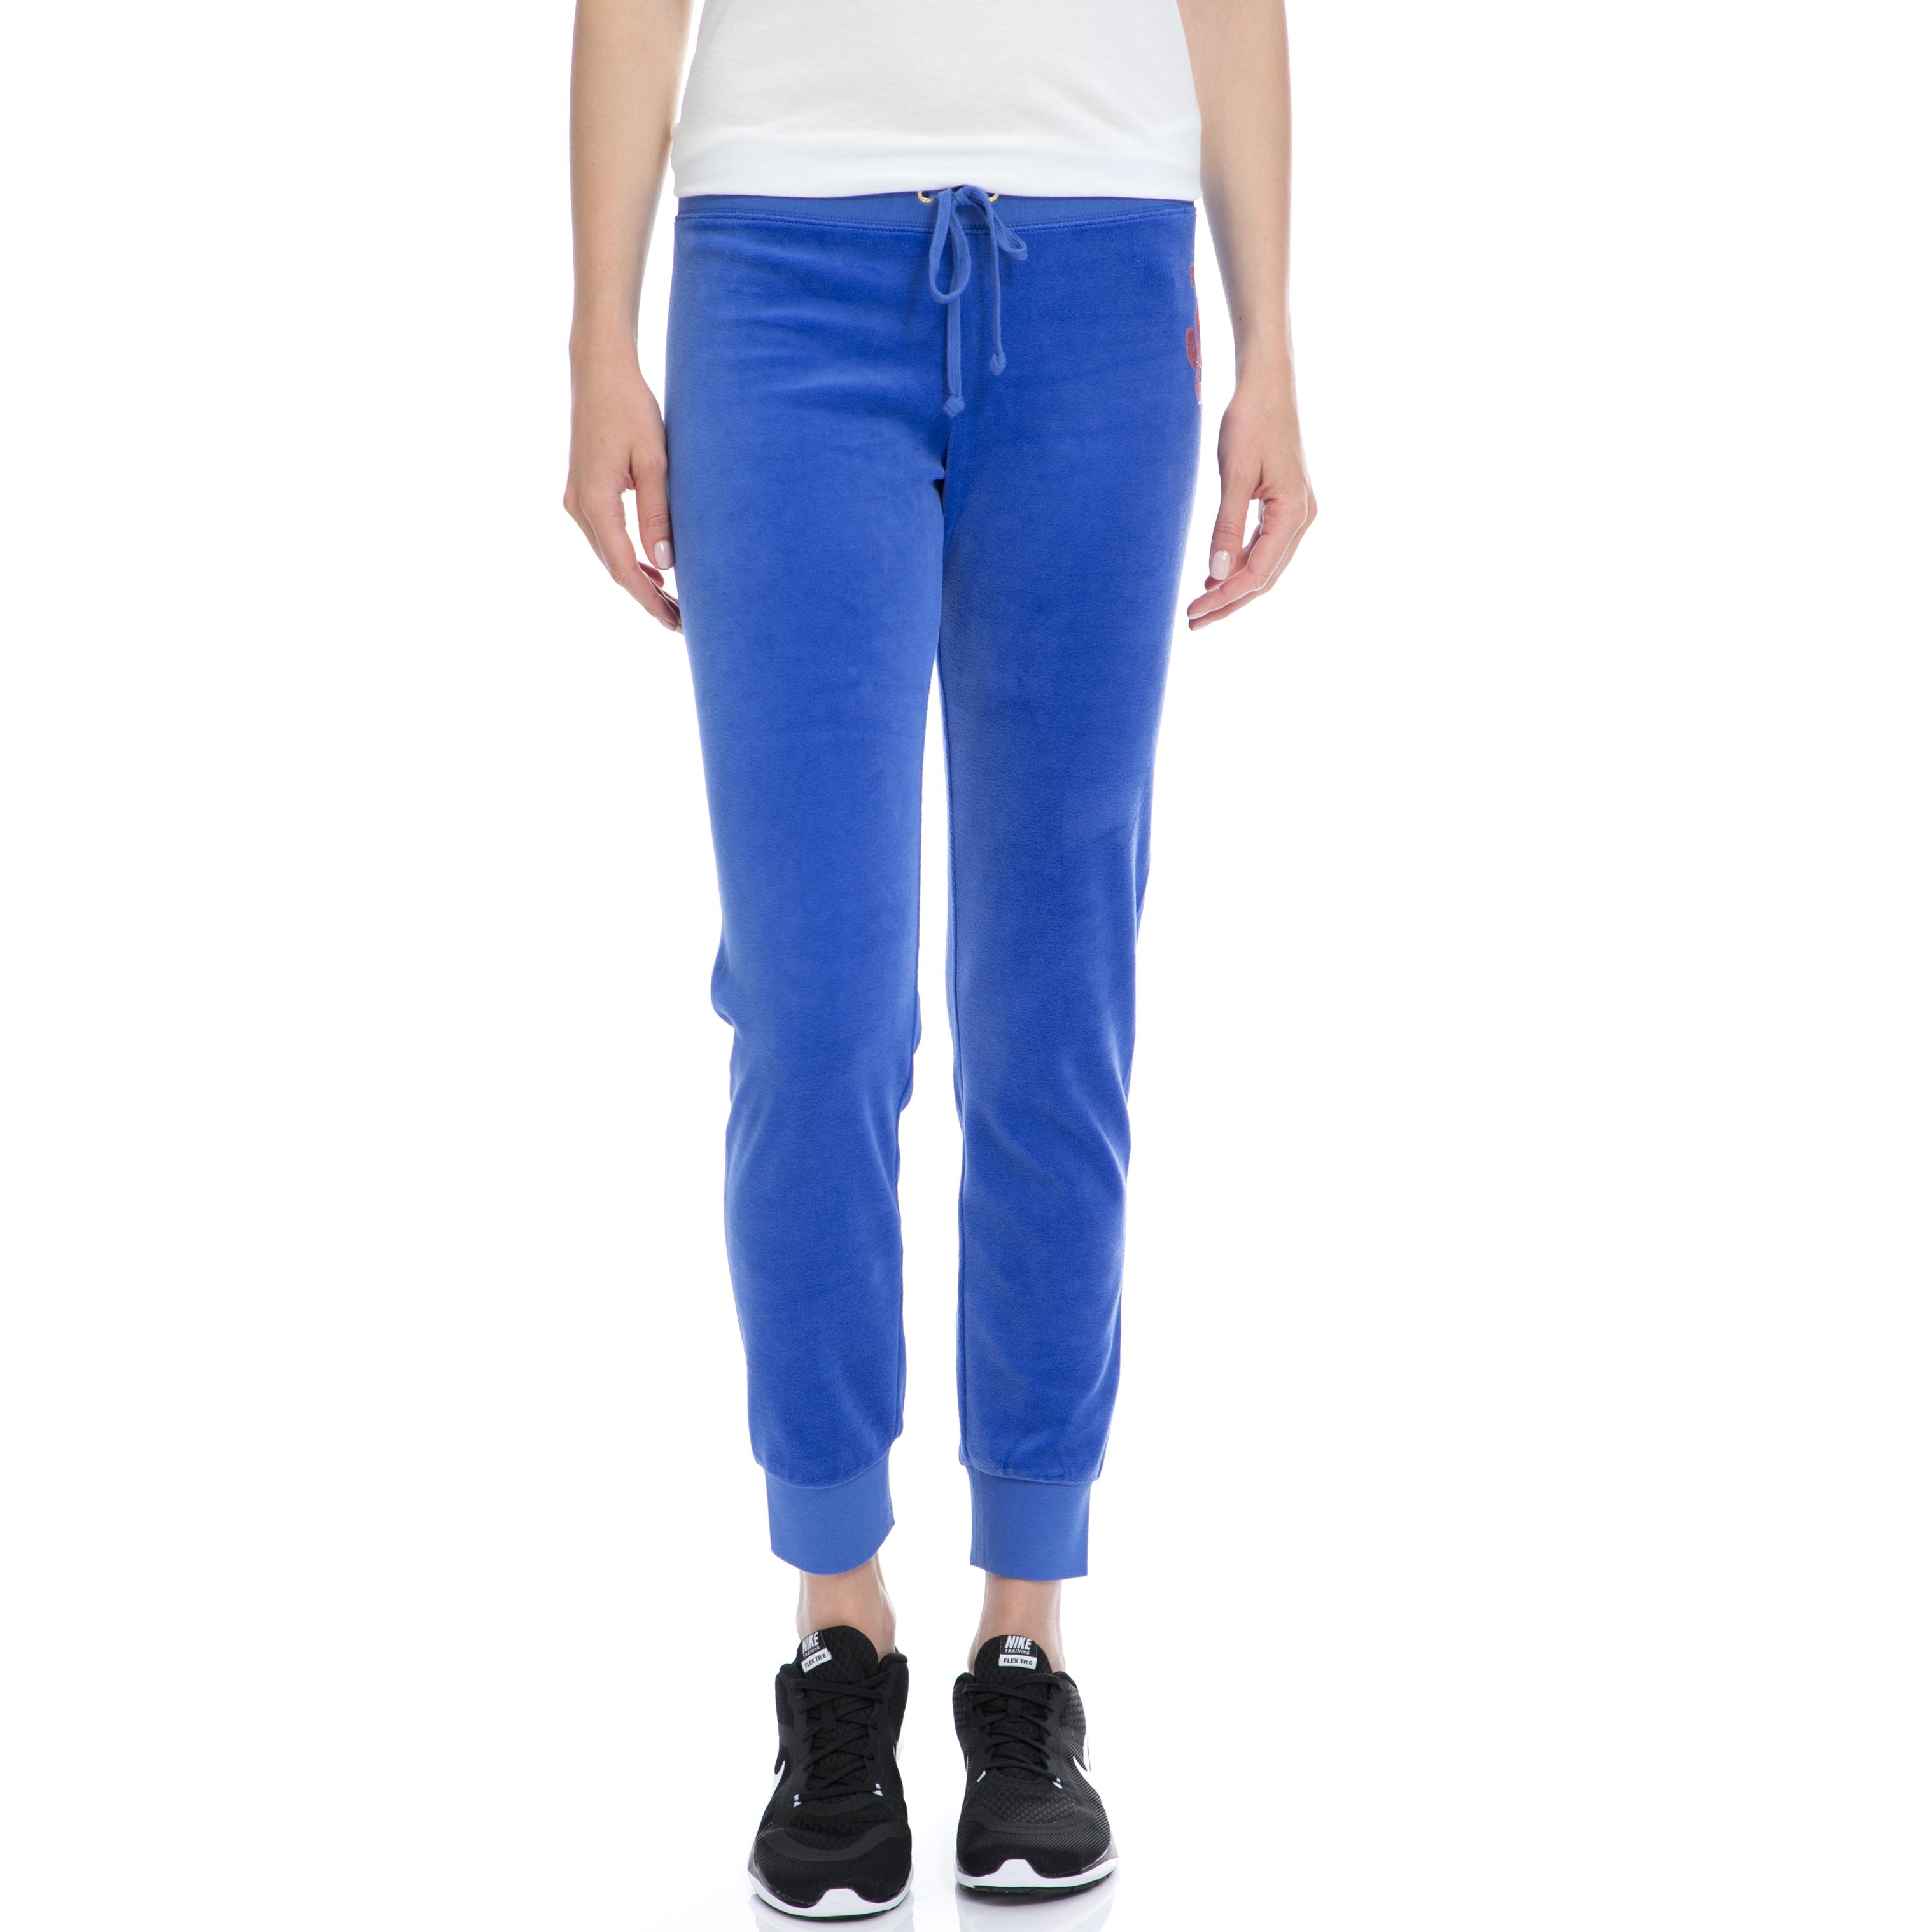 JUICY COUTURE – Γυναικείο παντελόνι Juicy Couture μπλε